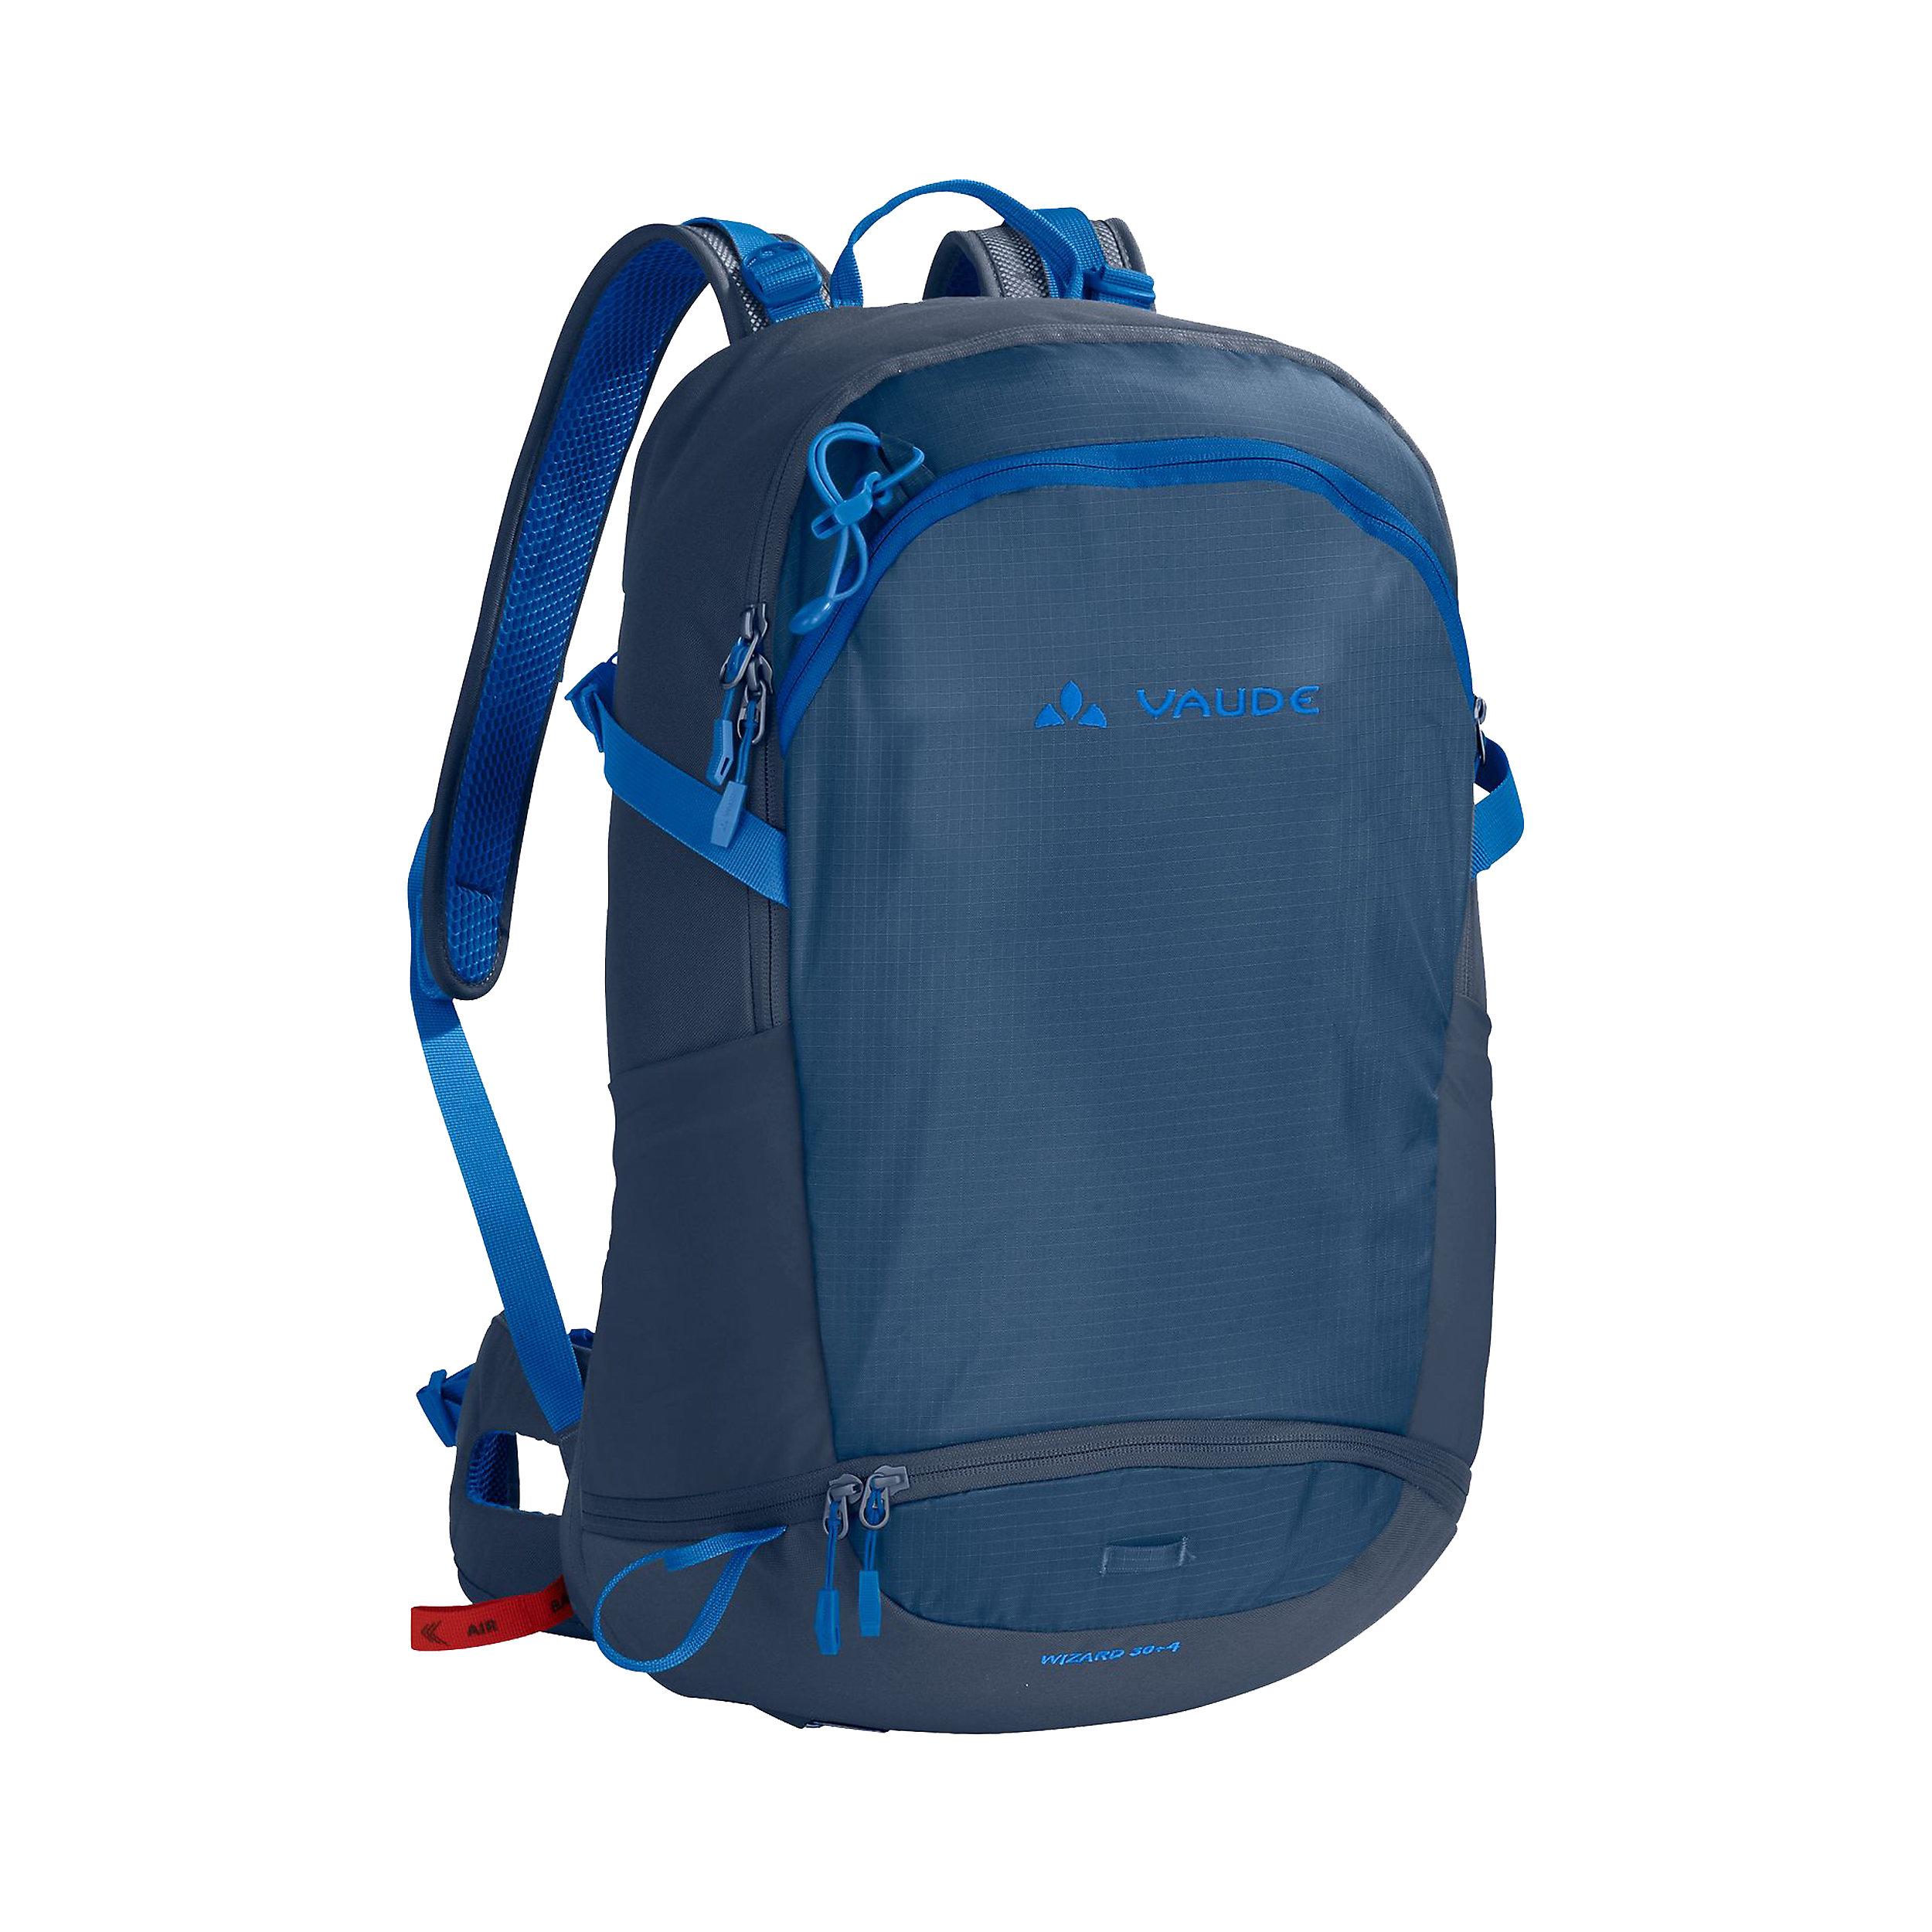 Backpack 30+4 Wizard 34 Liter